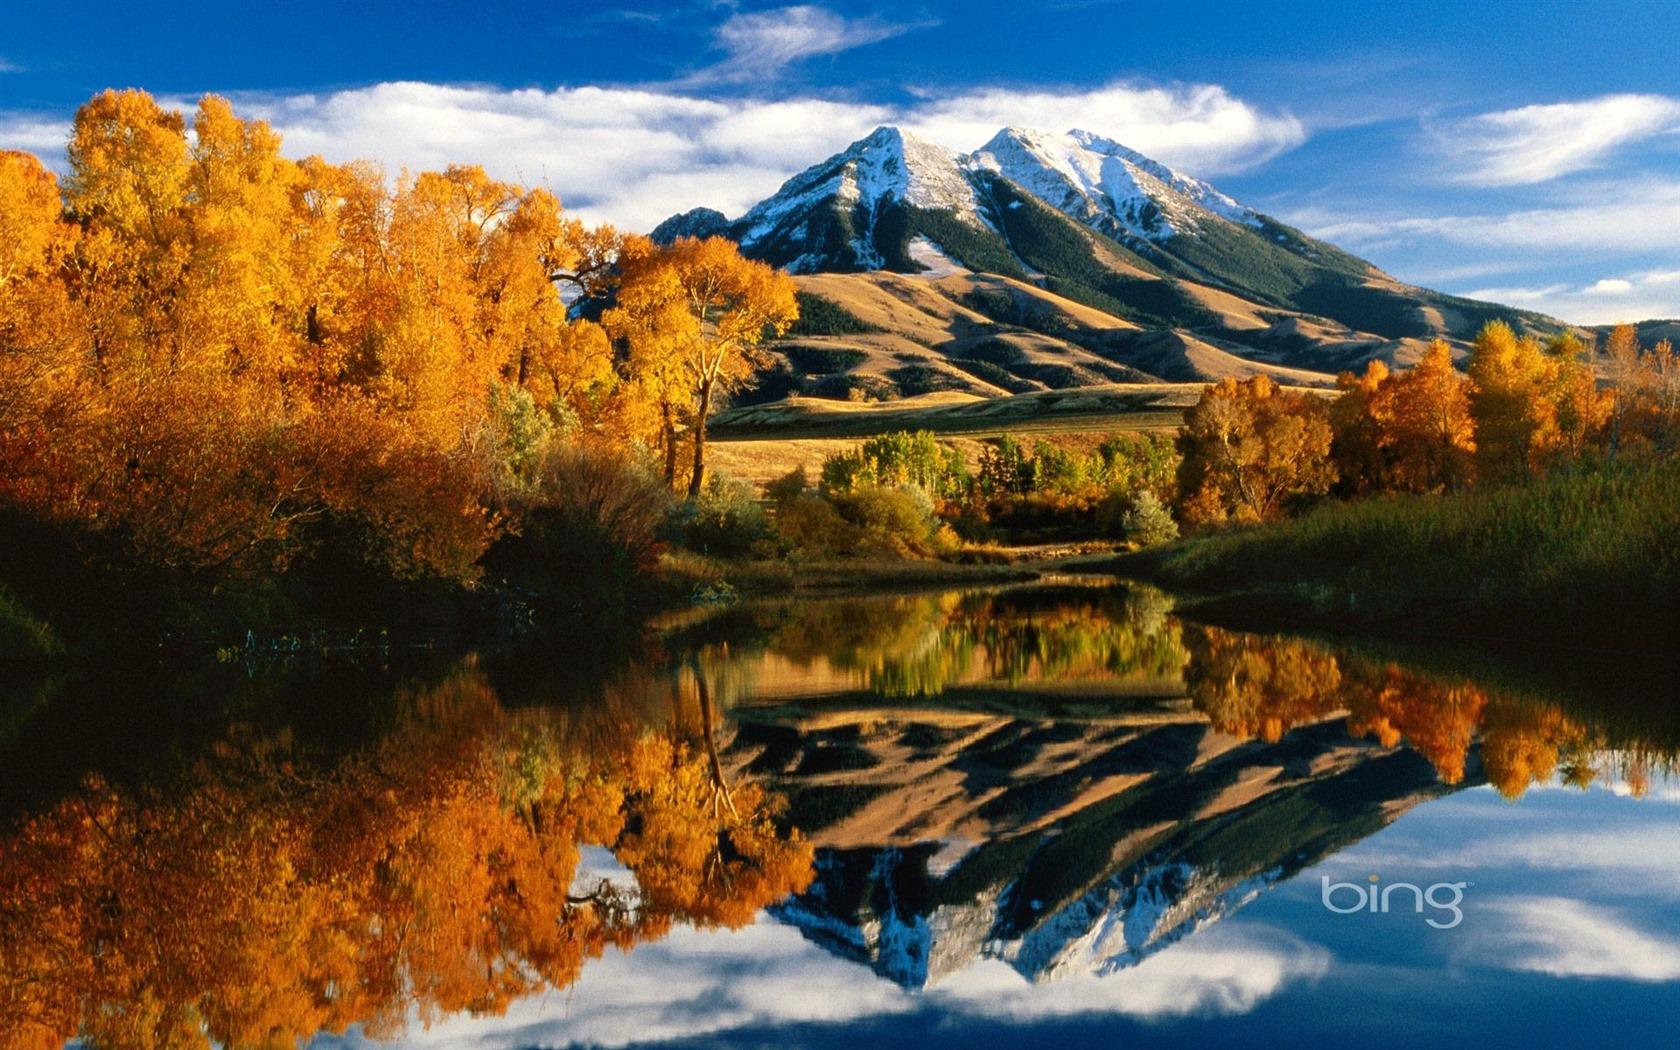 mountain lake widescreen HD wallpaper   1680x1050 Wallpaper Download 1680x1050